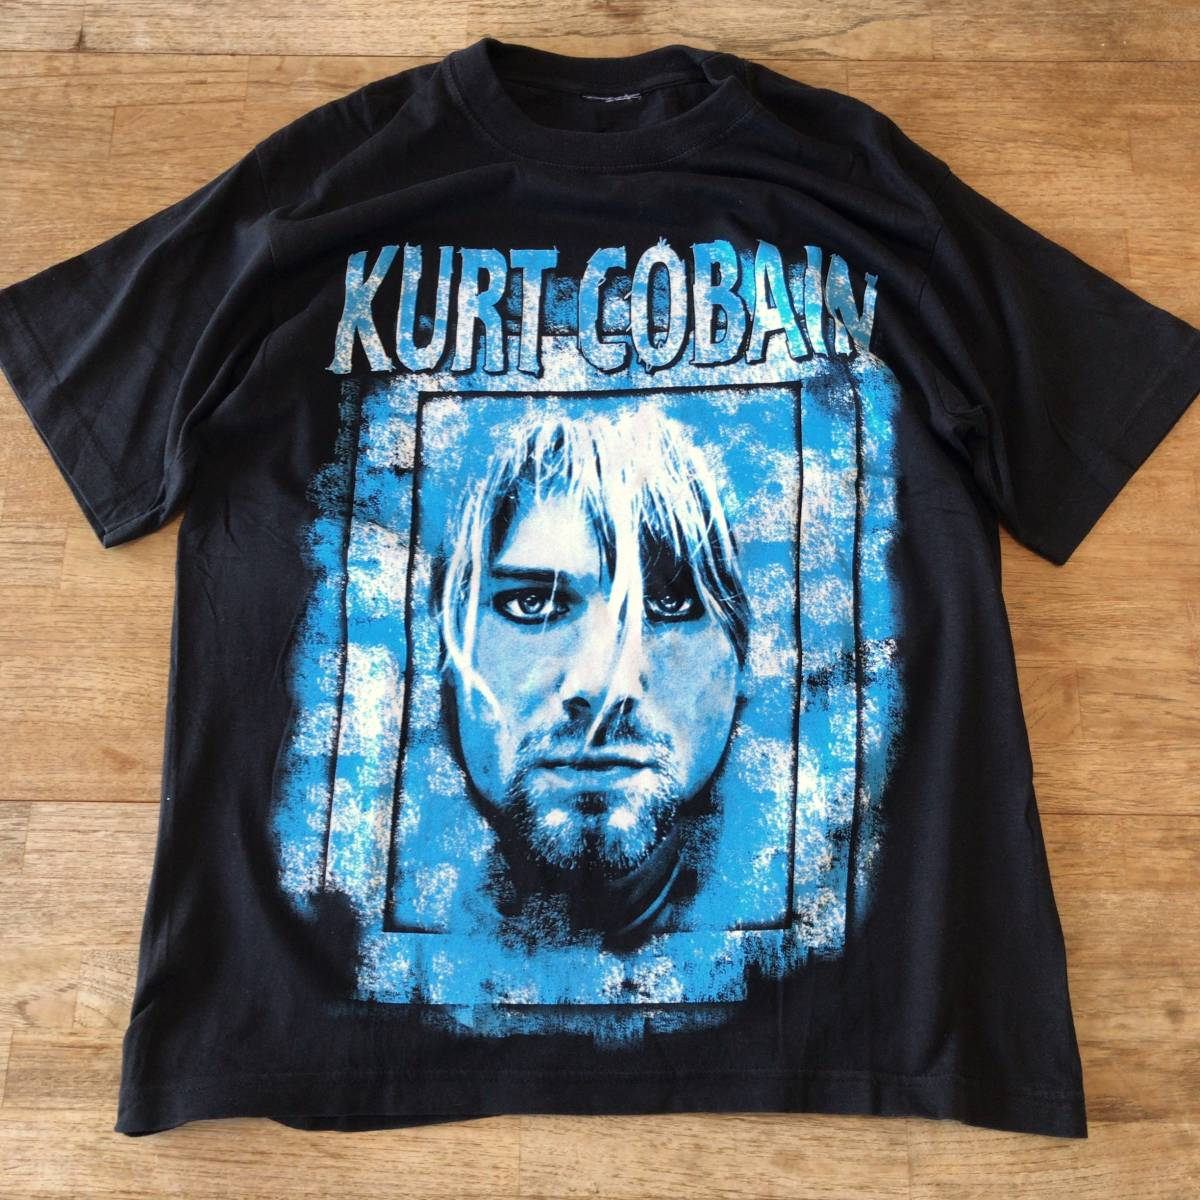 90s カートコバーン ビンテージ Tシャツ 追悼 nirvana ニルヴァーナ ニルバーナ レア バンドT ロックT kurt cobain vintage_画像1